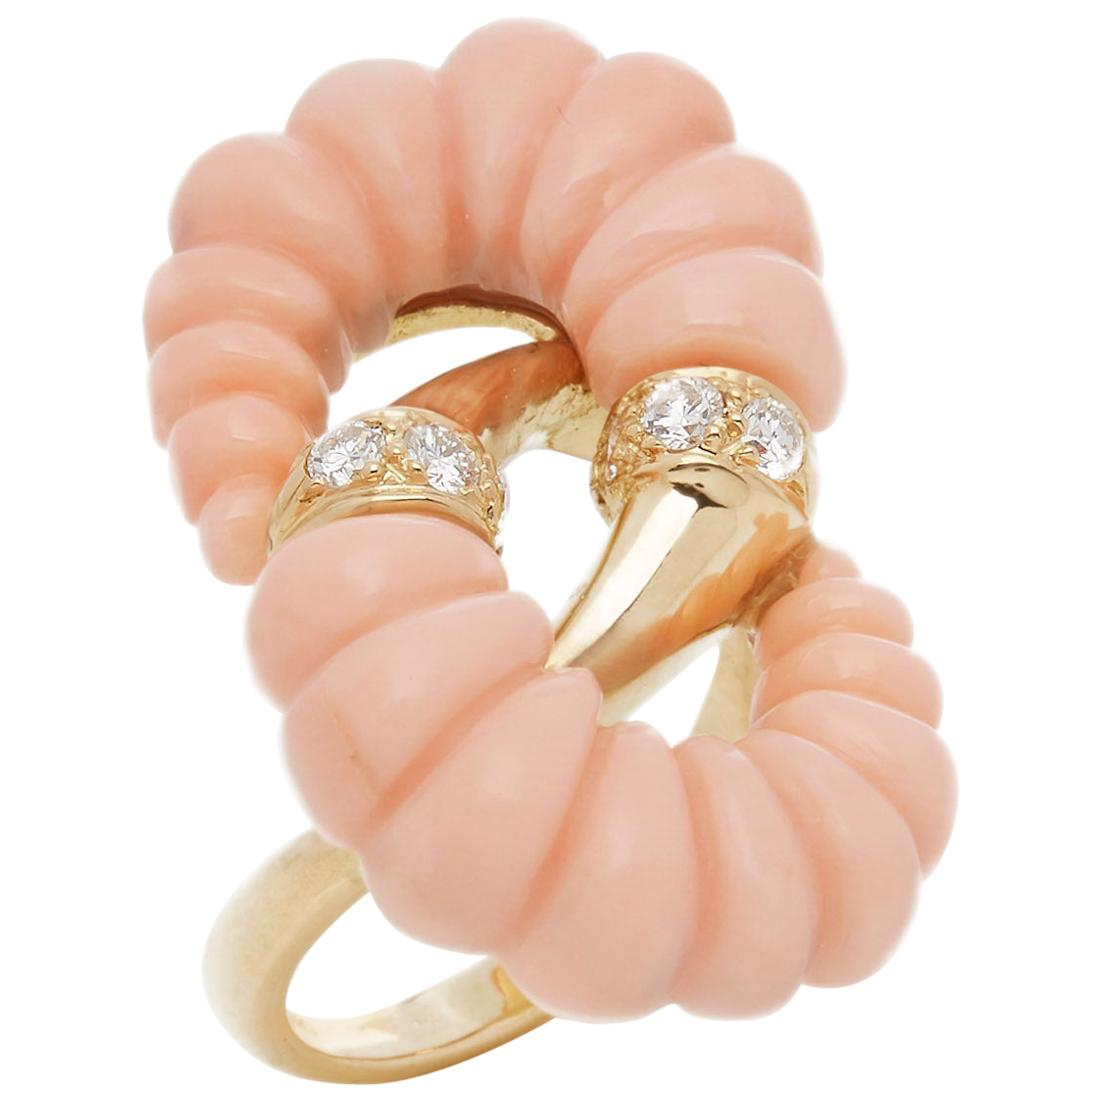 Van Cleef & Arpels 18 Karat Yellow Gold Coral and Diamond Vintage Ring